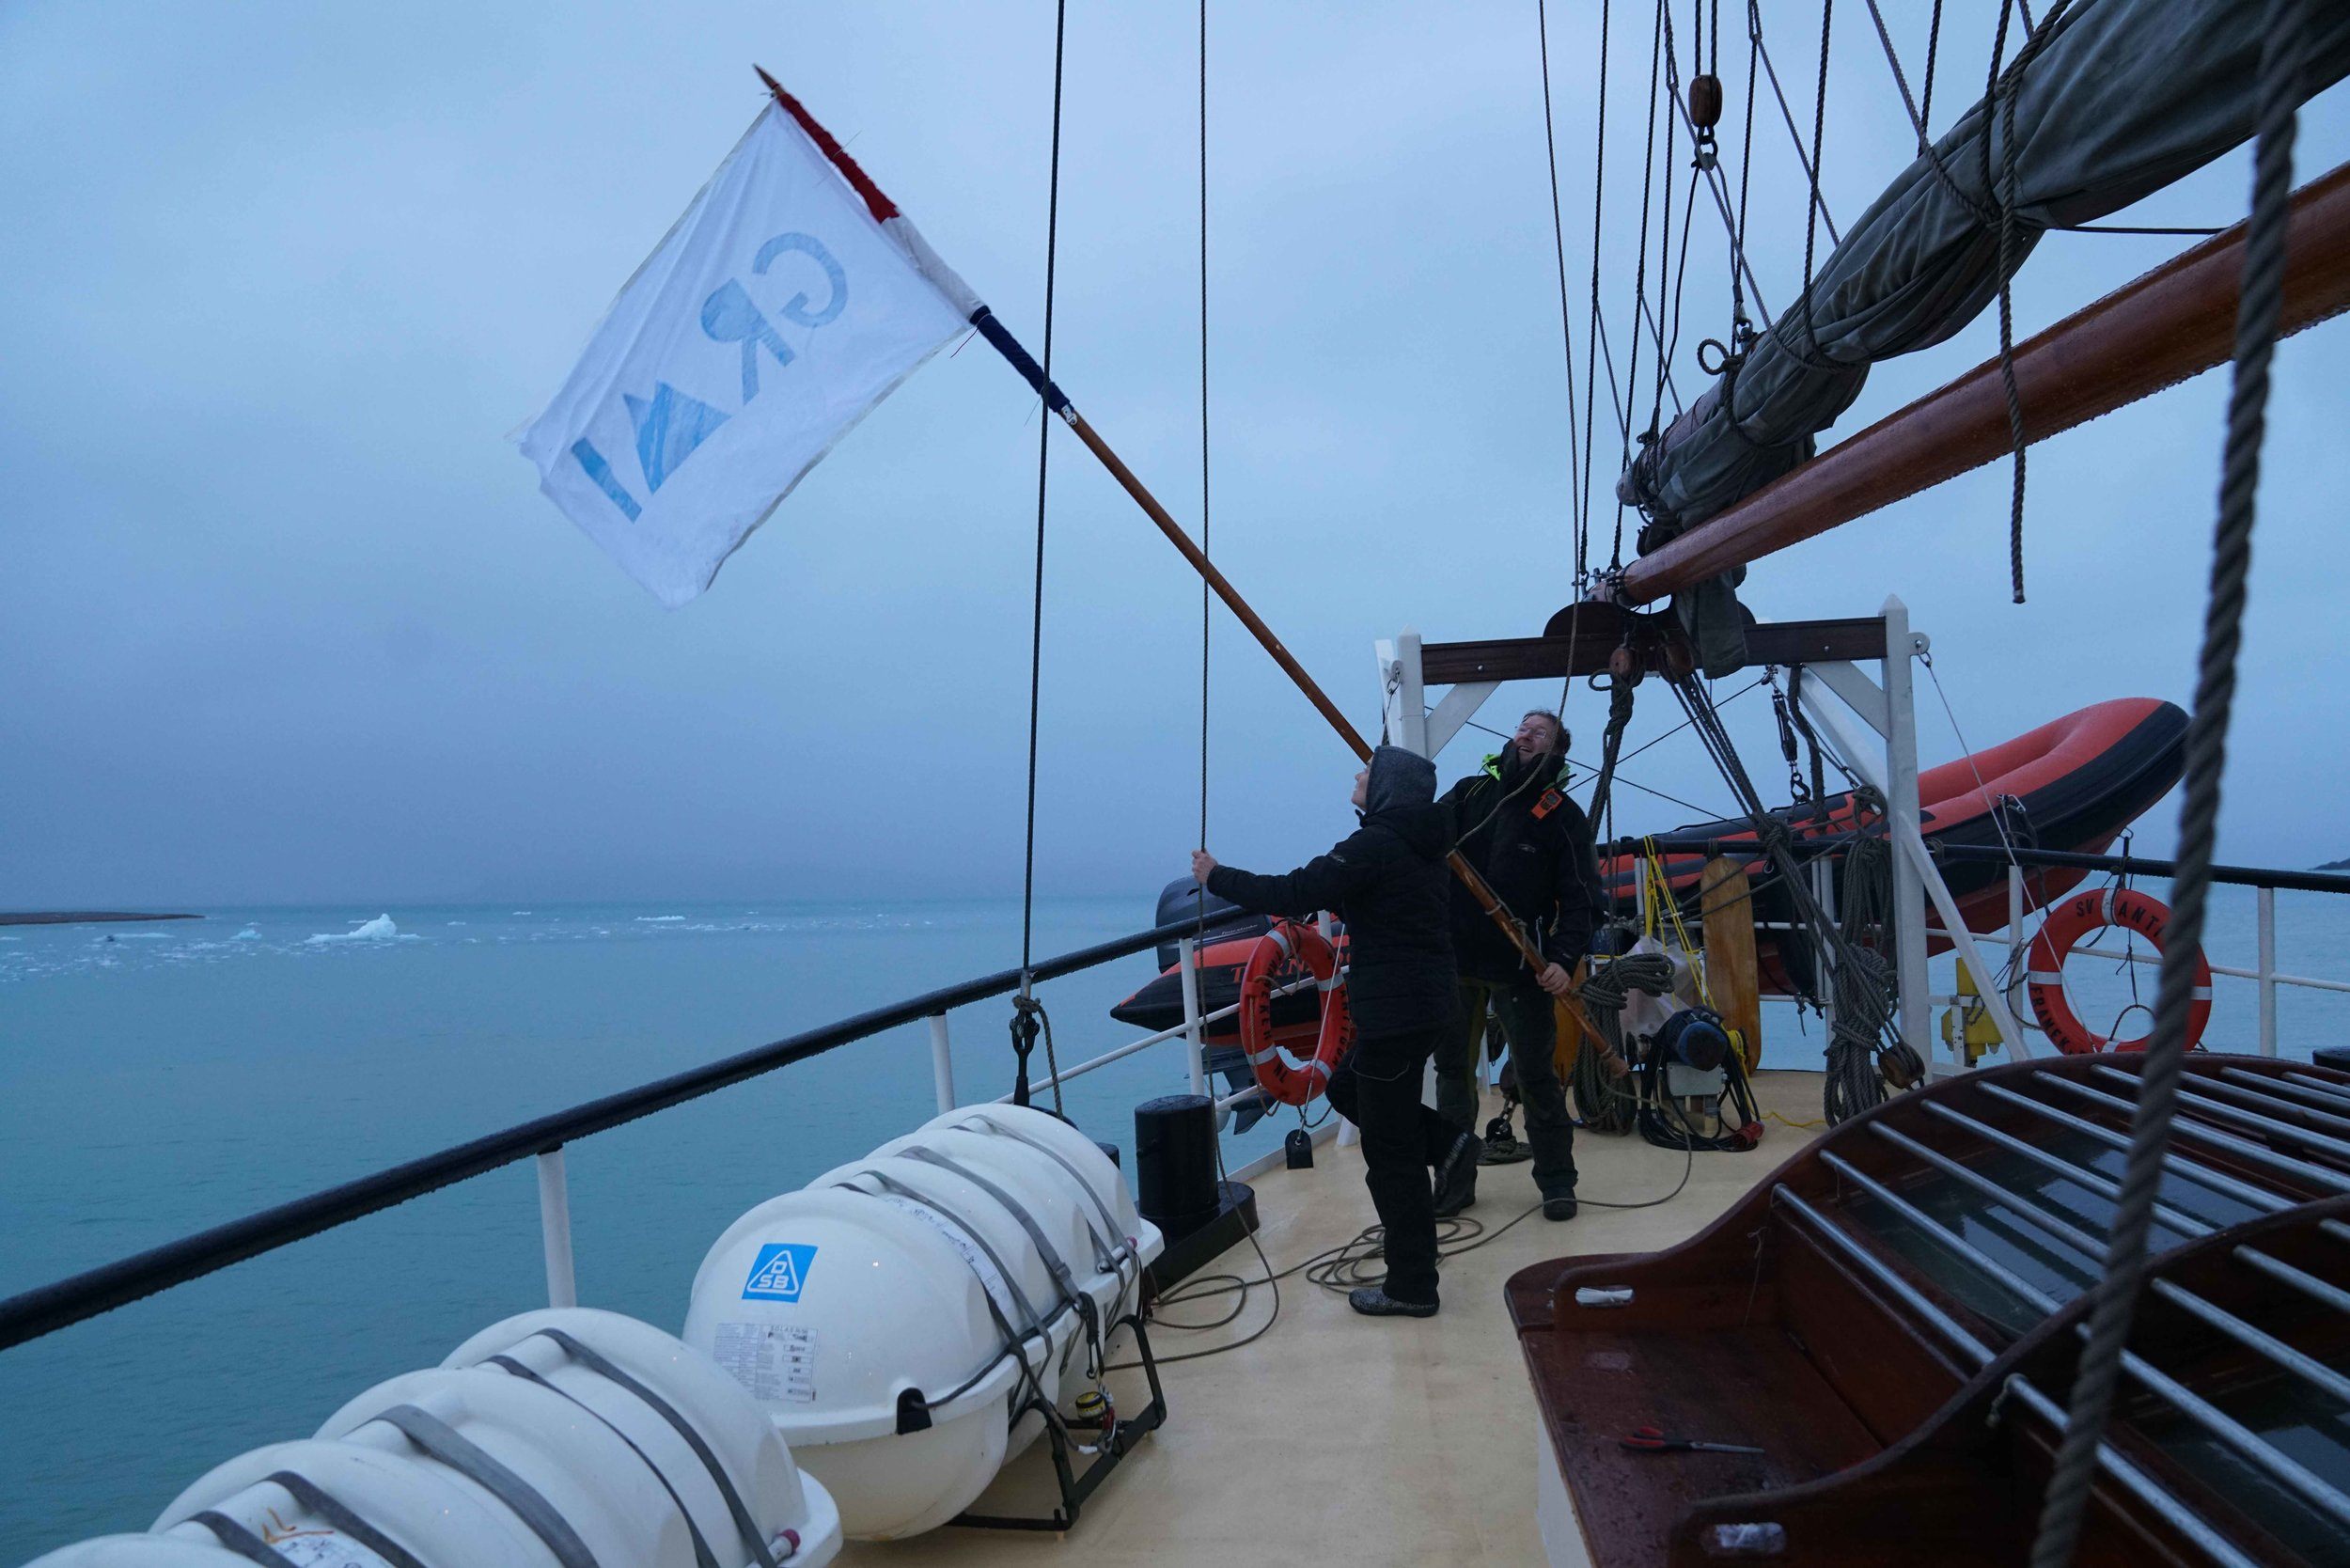 Hoisting the GRMI flag at Fjortende Julibukta. Photo credit courtesy of the artist.